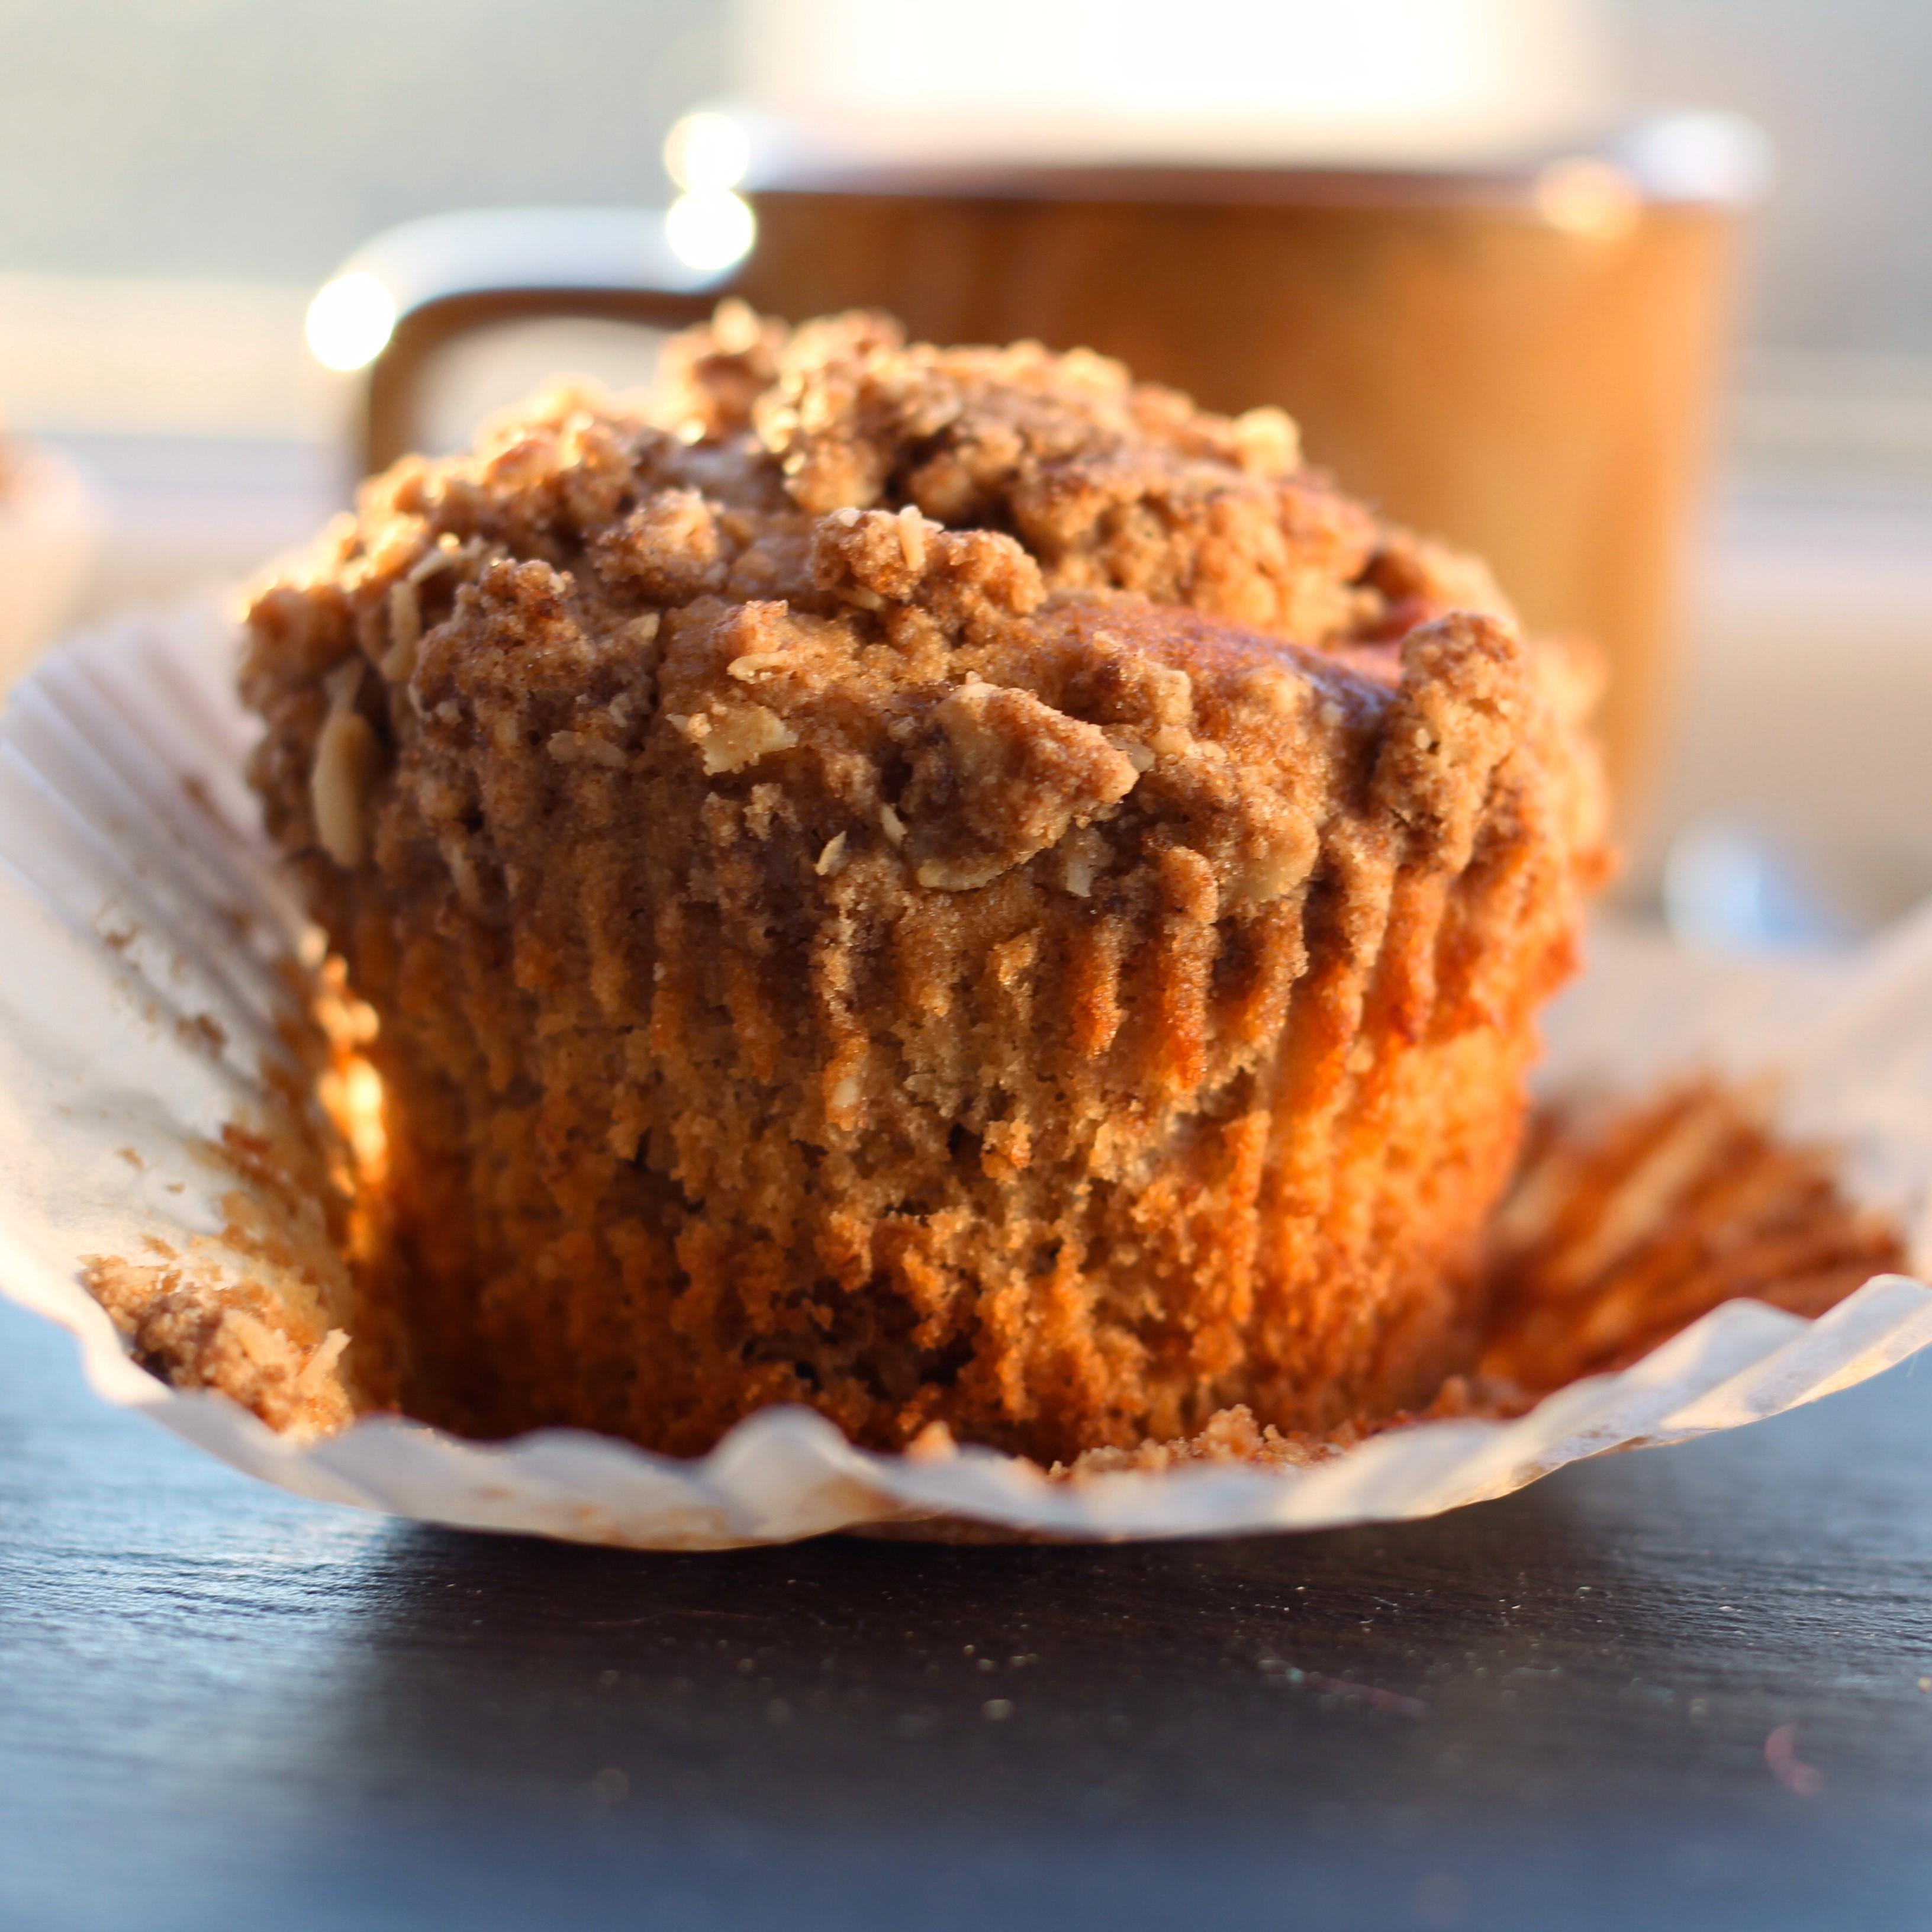 Gluten-Free Banana-Nut Buckwheat Muffins